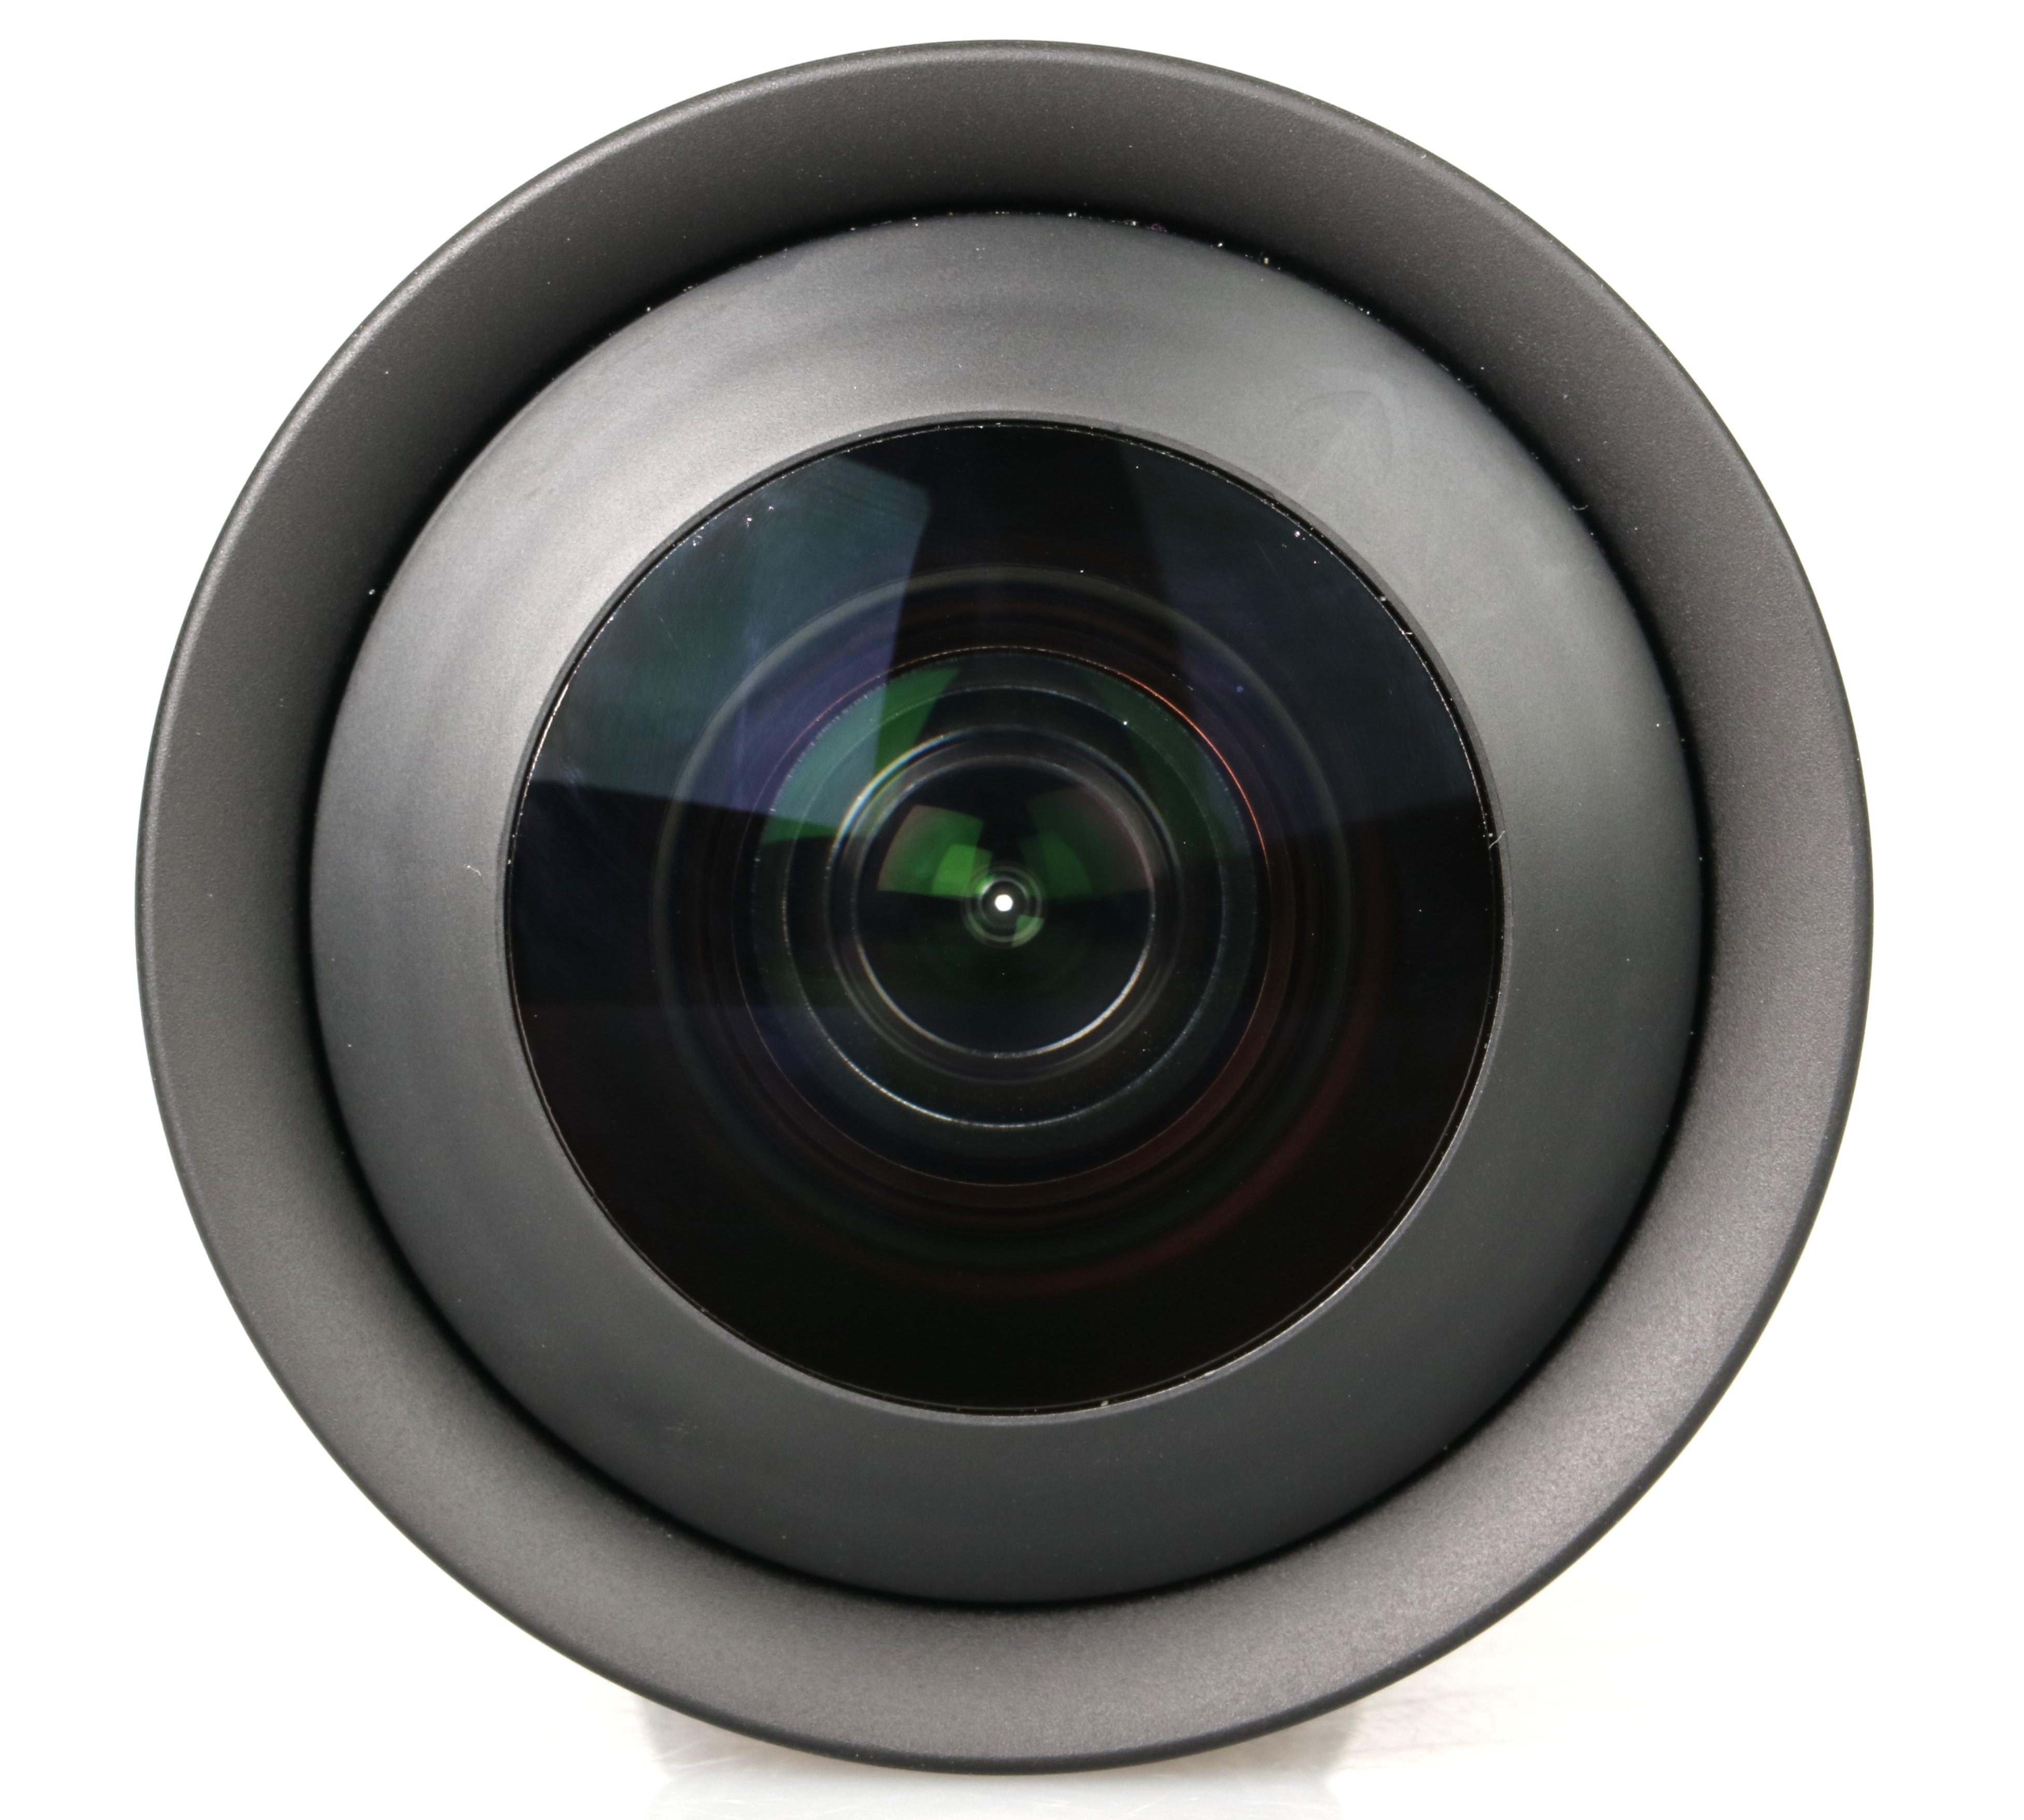 Lensbaby f 3 5 circular fisheye lens review for Fish eye lense